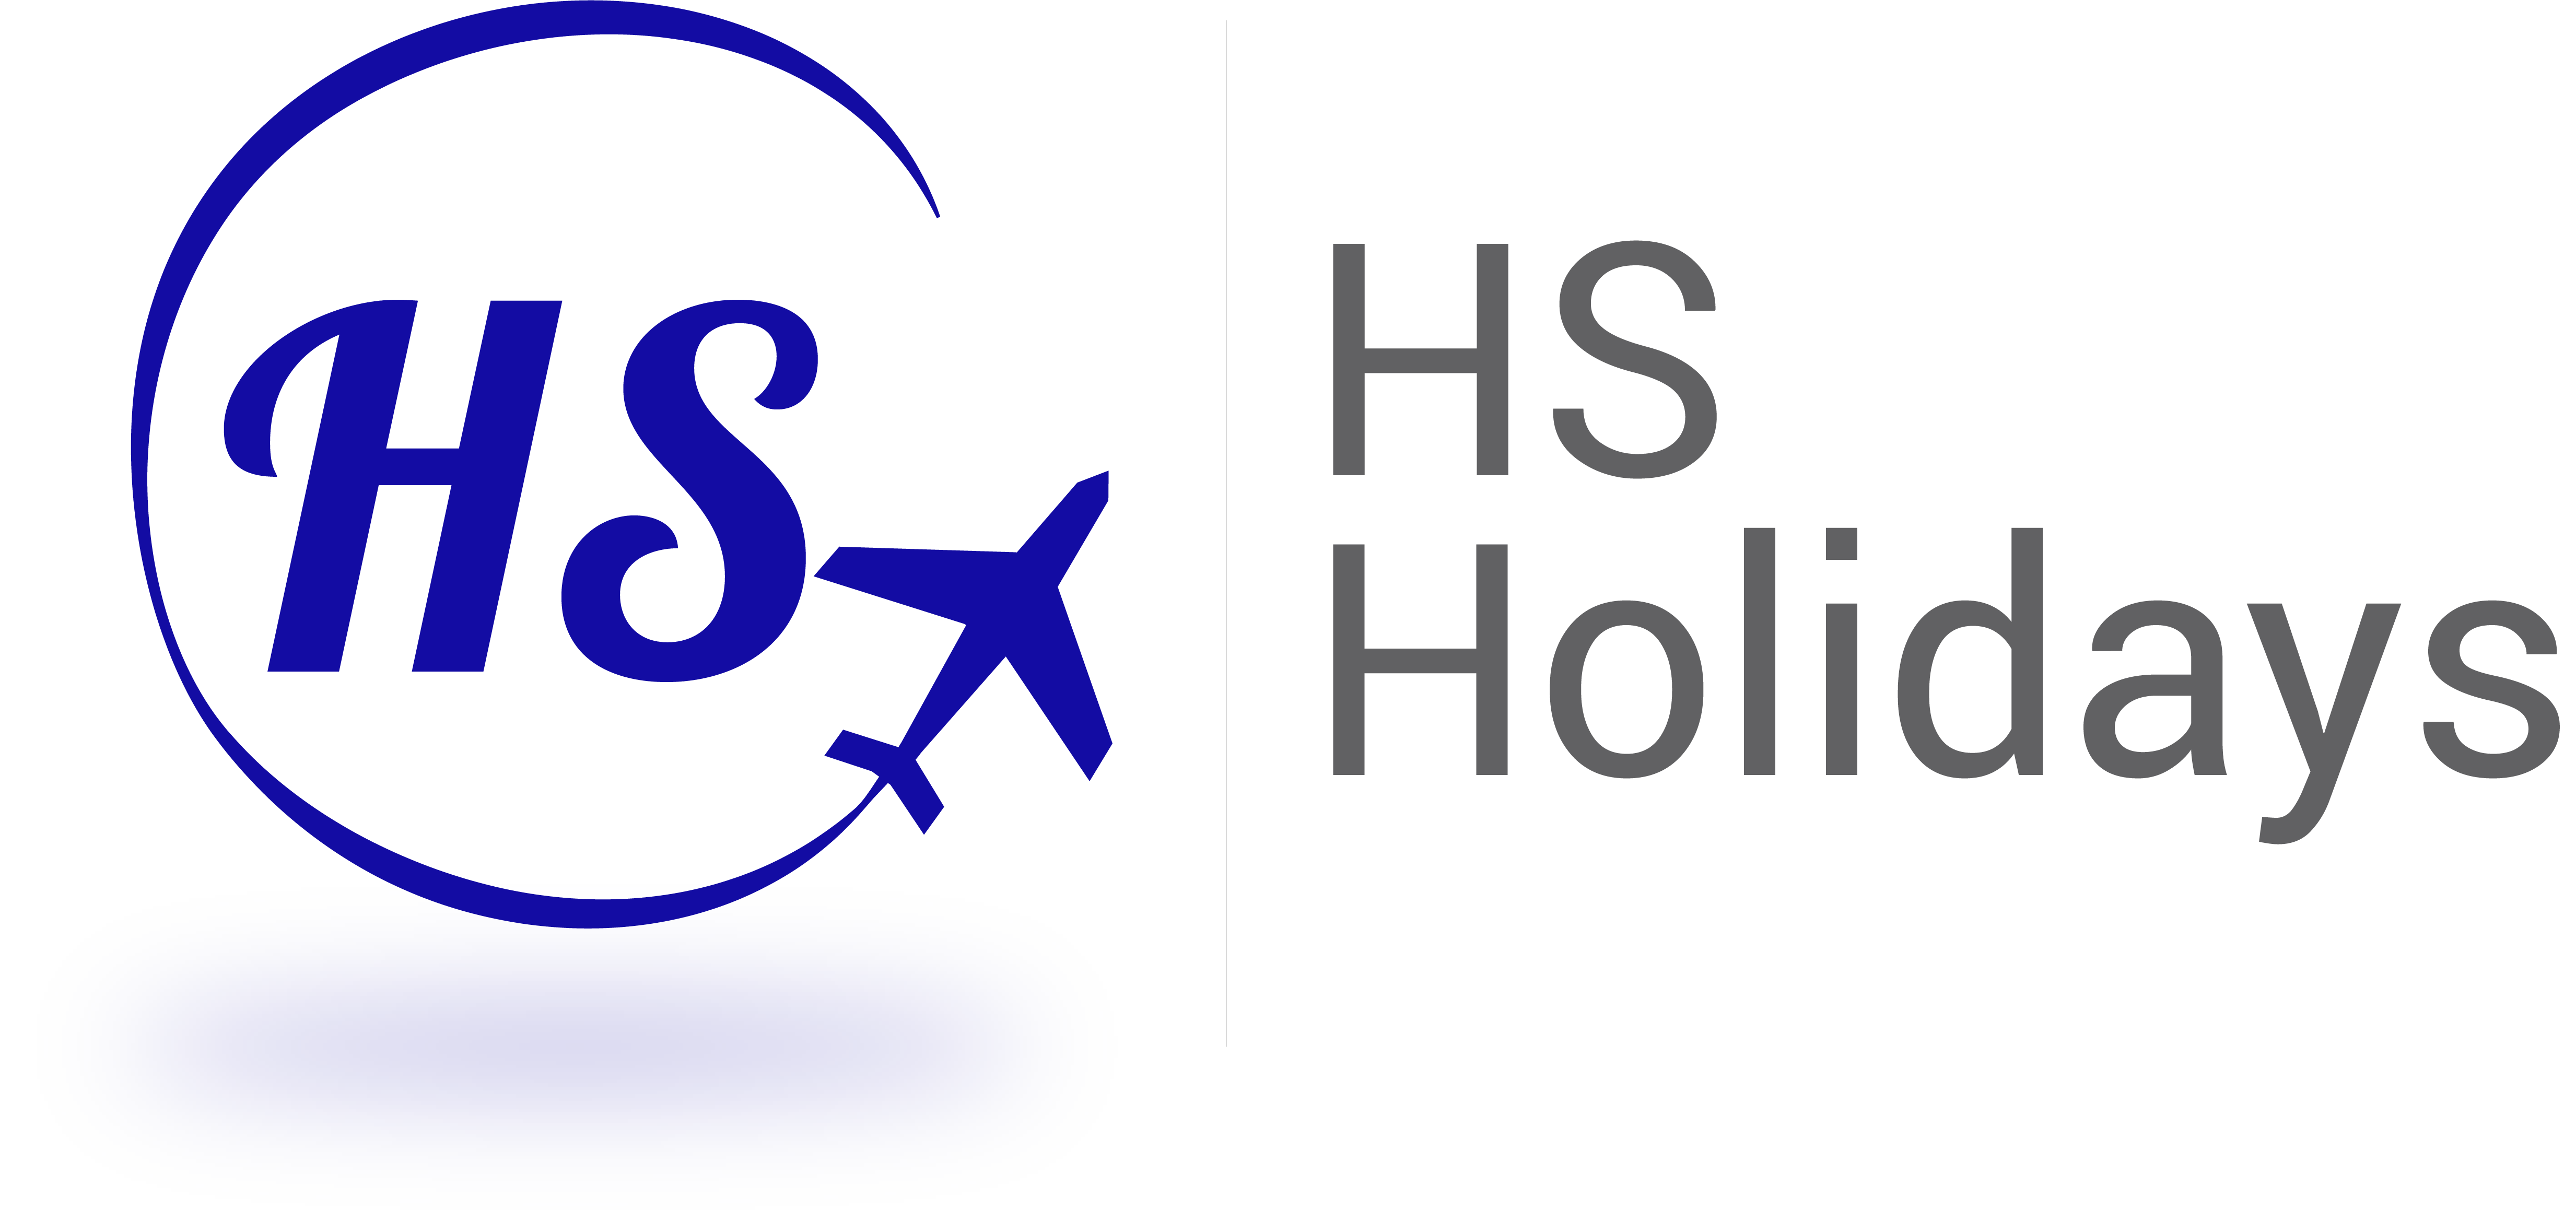 HSHolidays